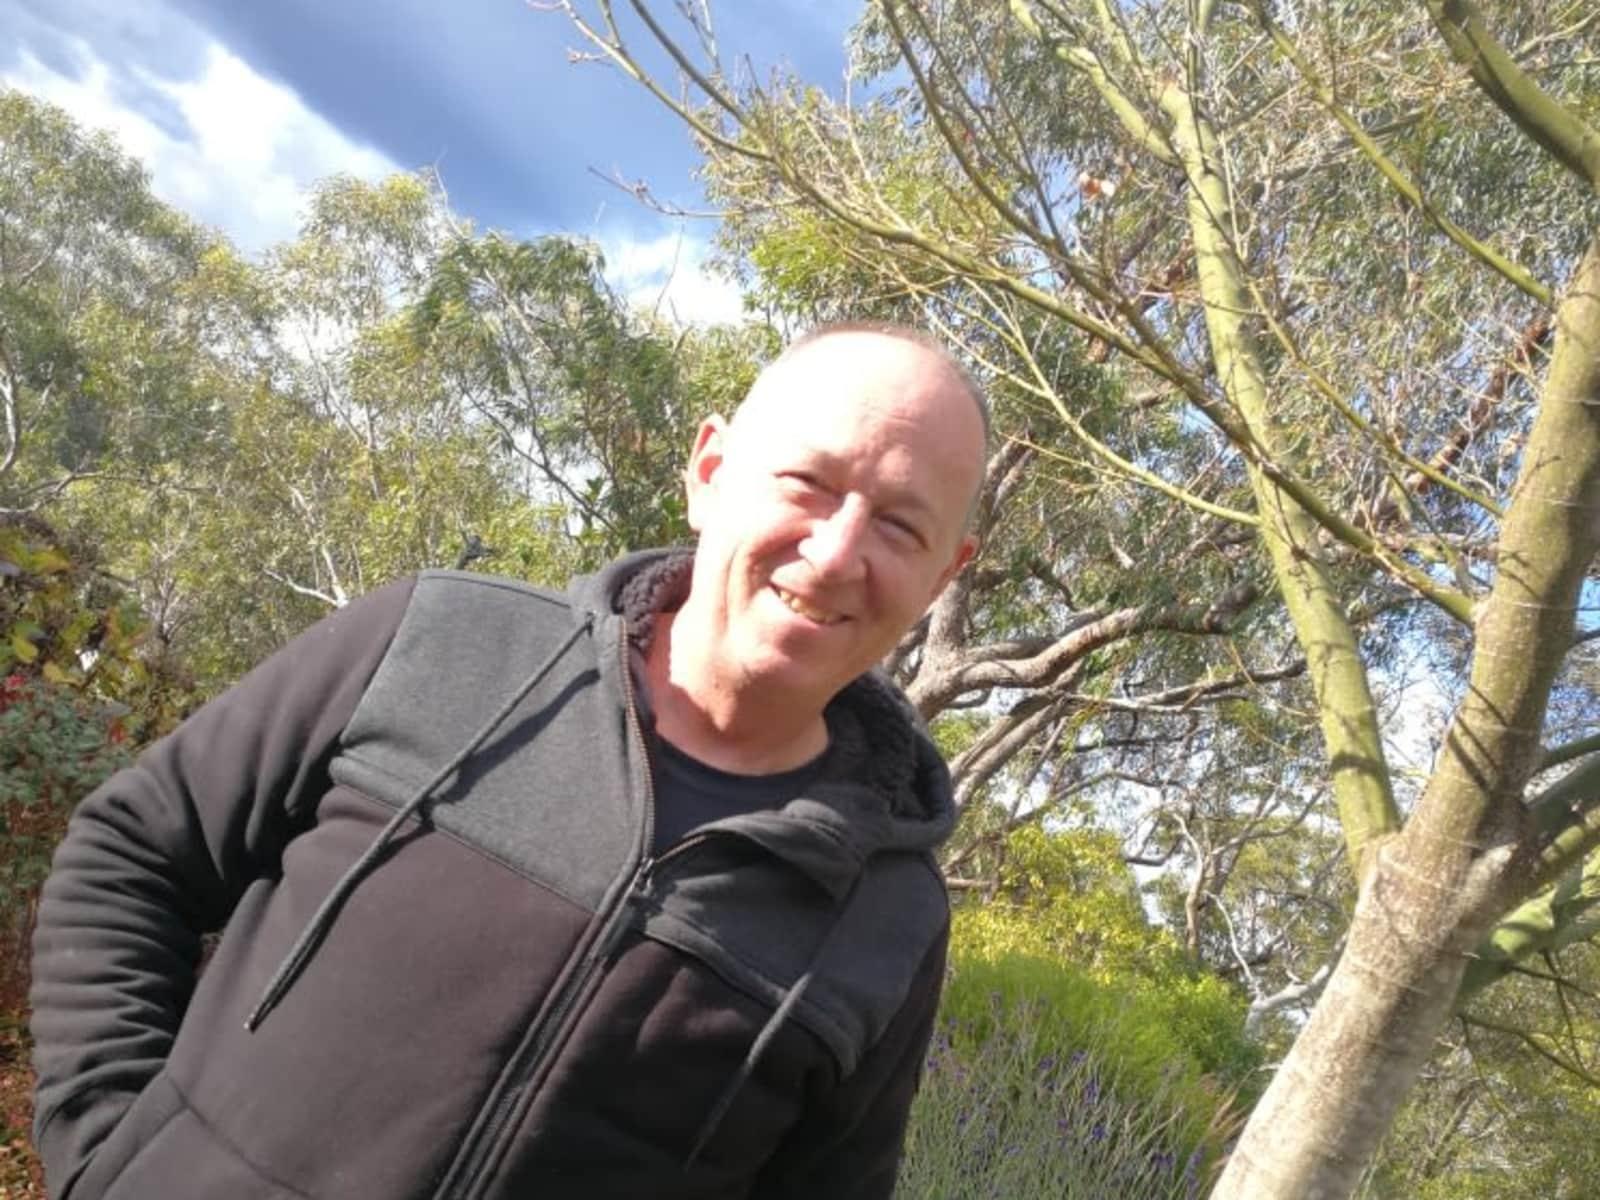 Derek from Baulkham Hills, New South Wales, Australia